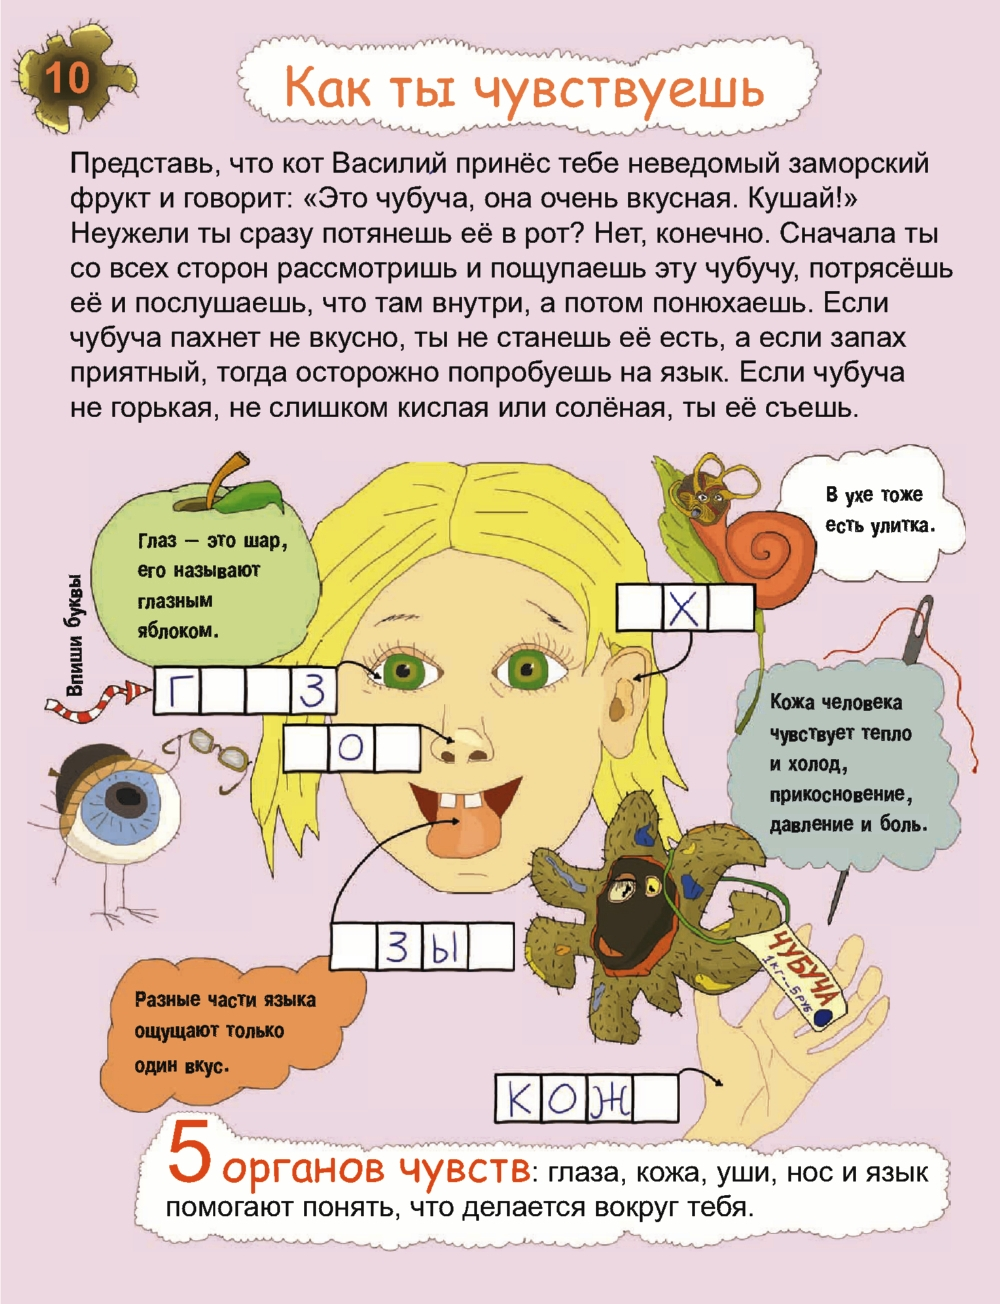 http://i1.imageban.ru/out/2013/12/09/1543b73b1ad8657b71e2b9cbe5b6f7e8.jpg